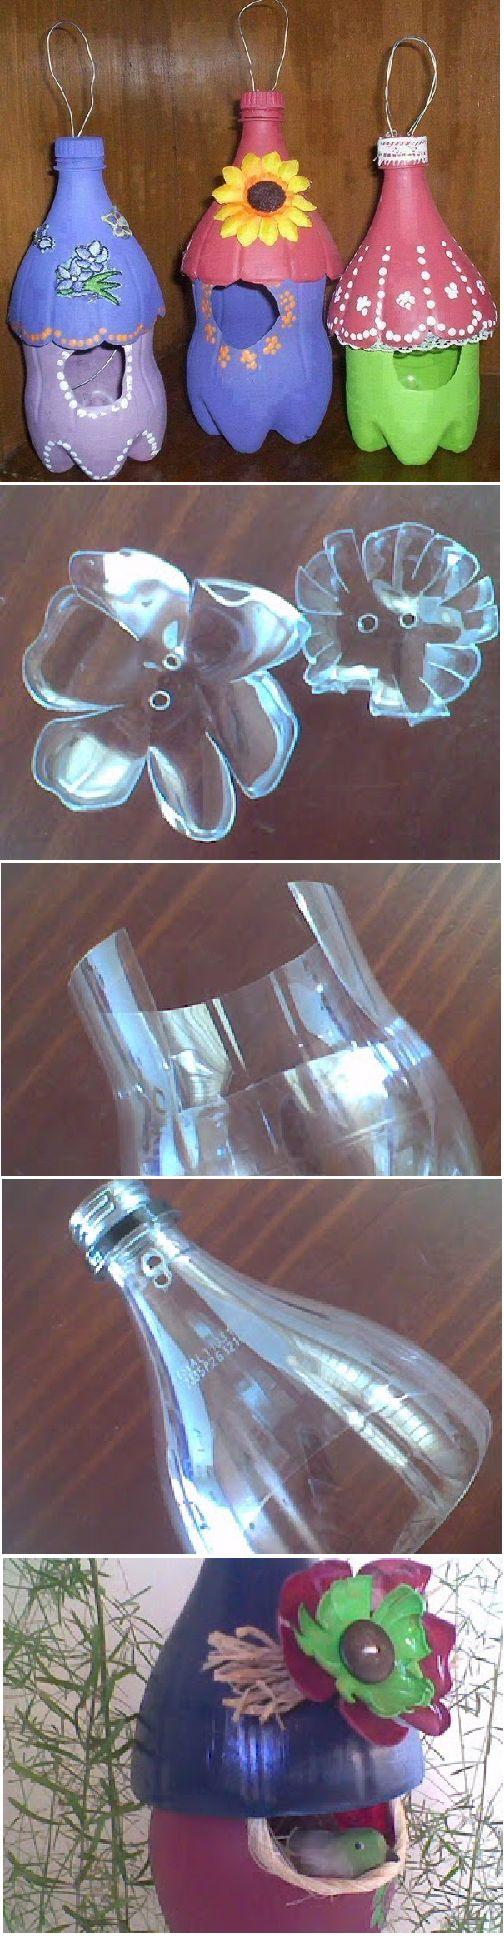 DIY Plastic Bottle Bird House 219 best